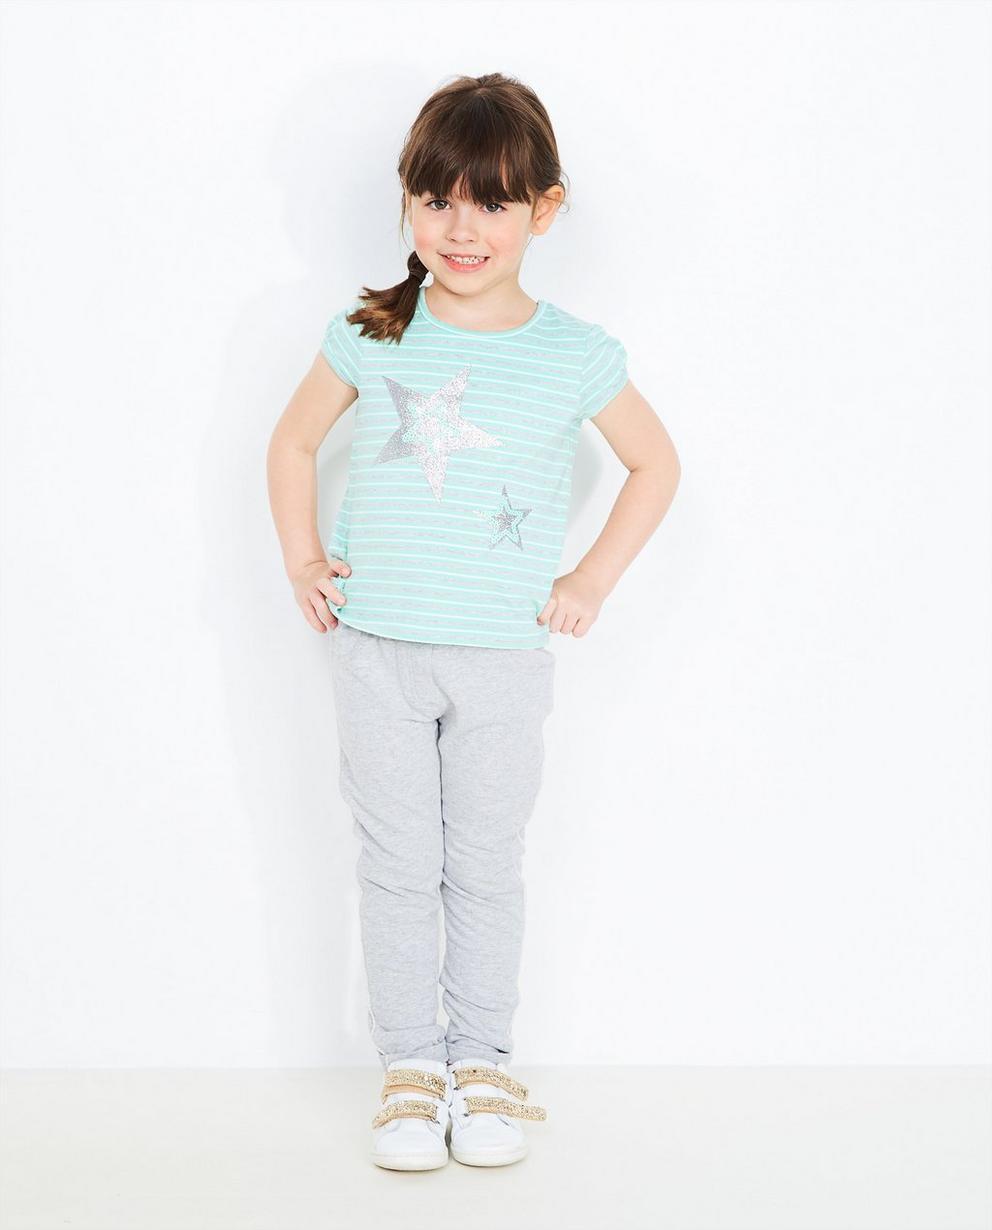 Gestreiftes T-Shirt - in Mintgrün-Grau-Weiß - JBC